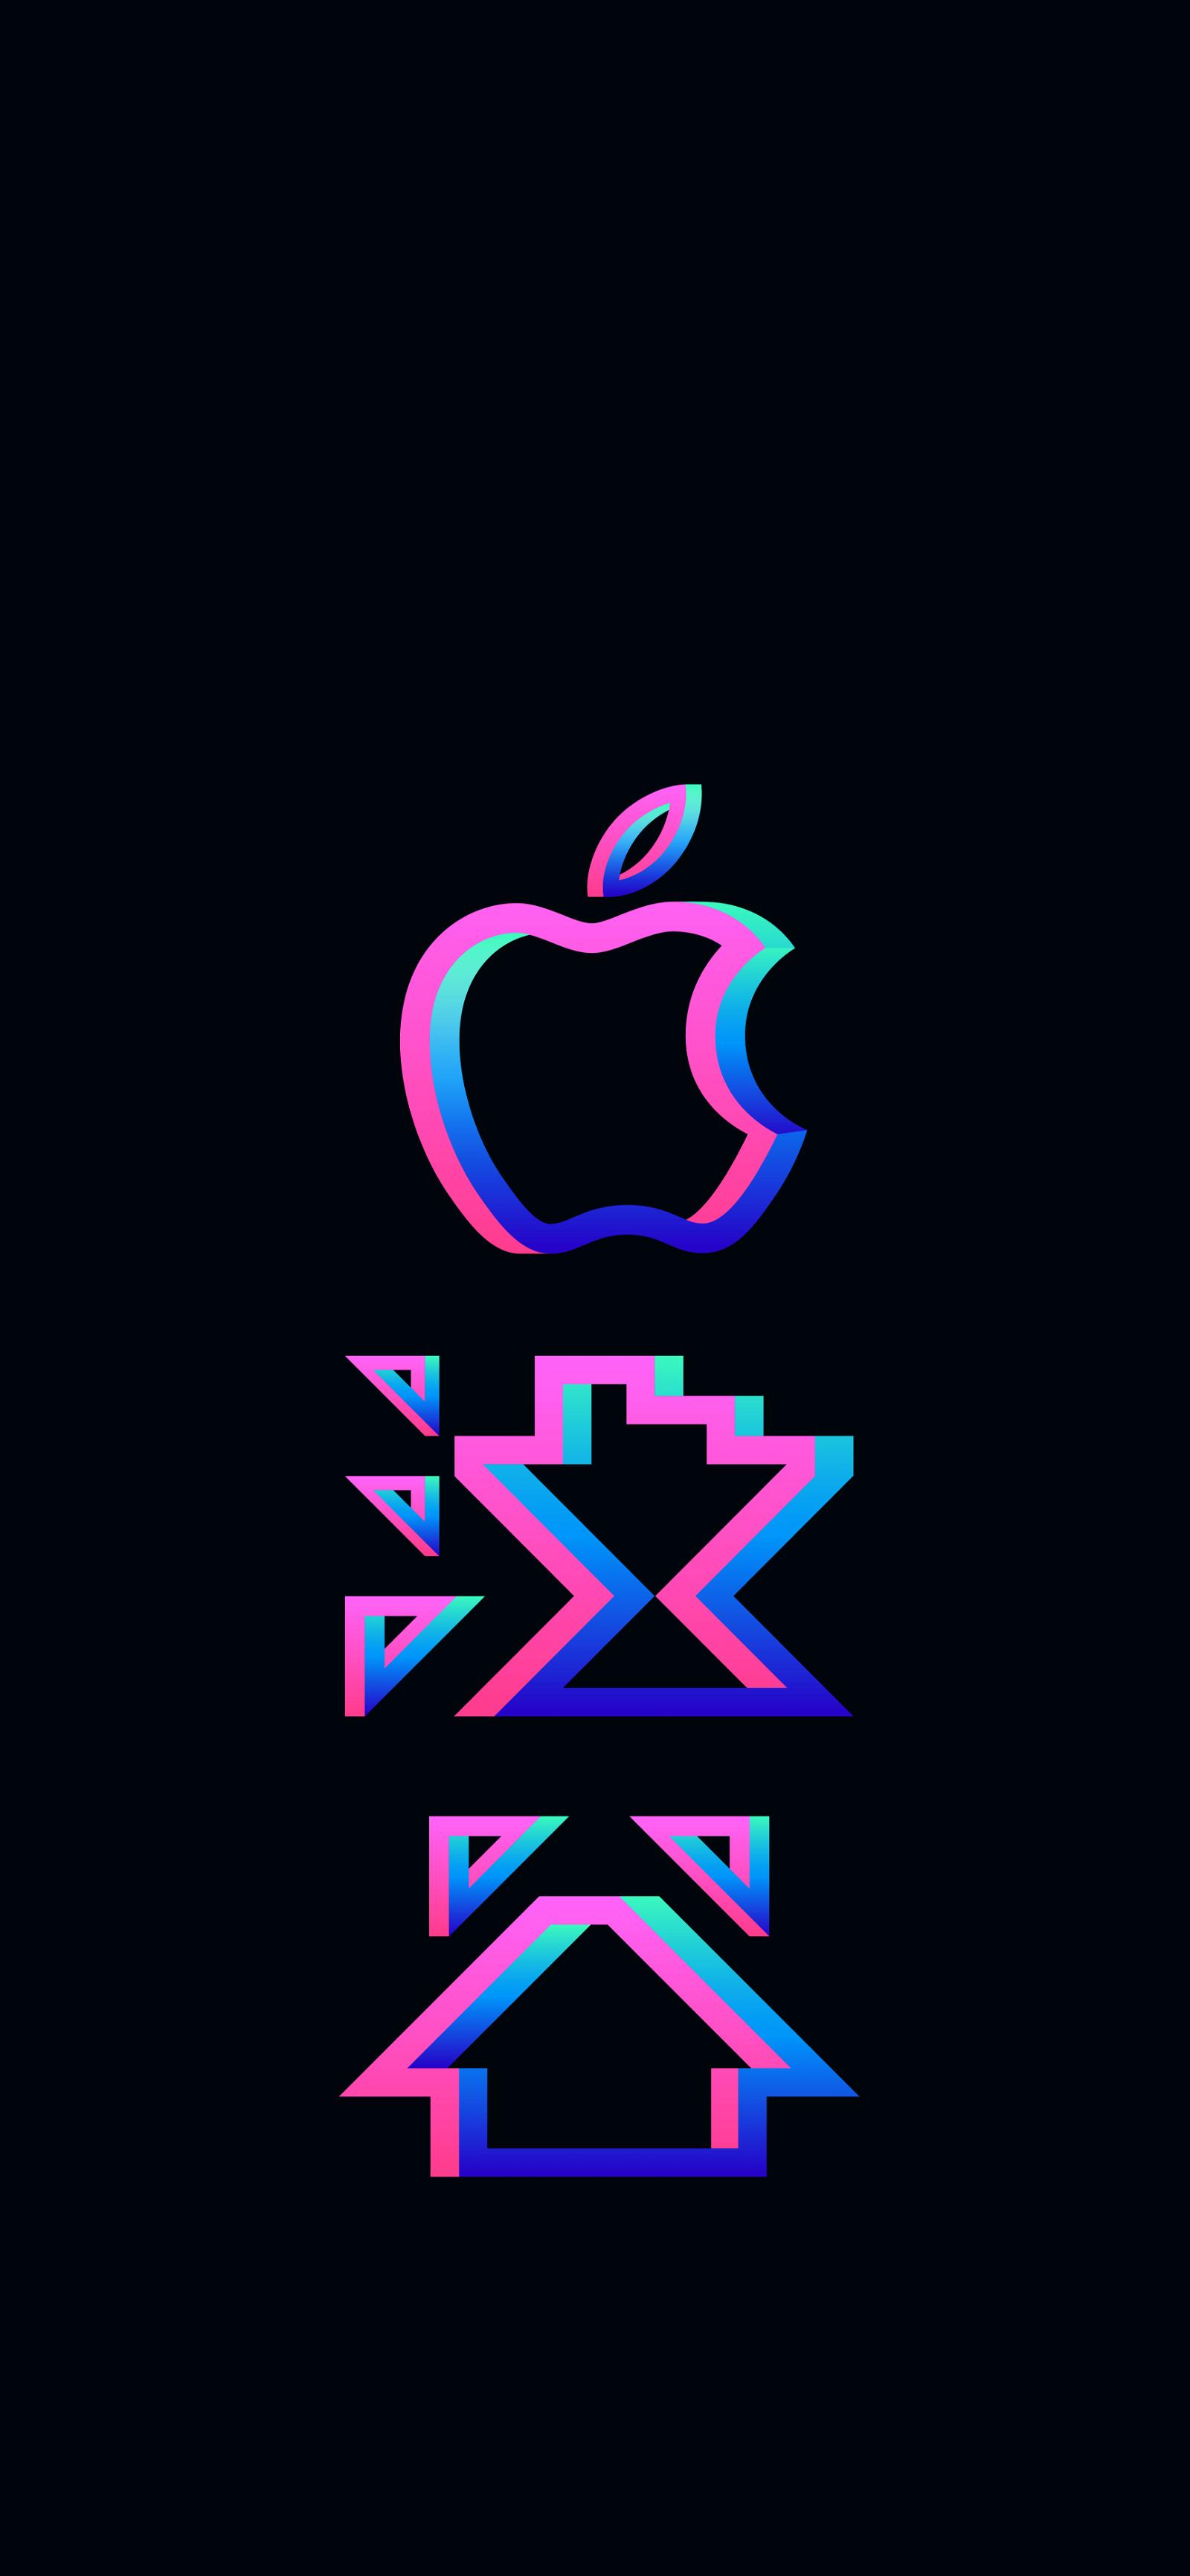 wallpaper Apple Store